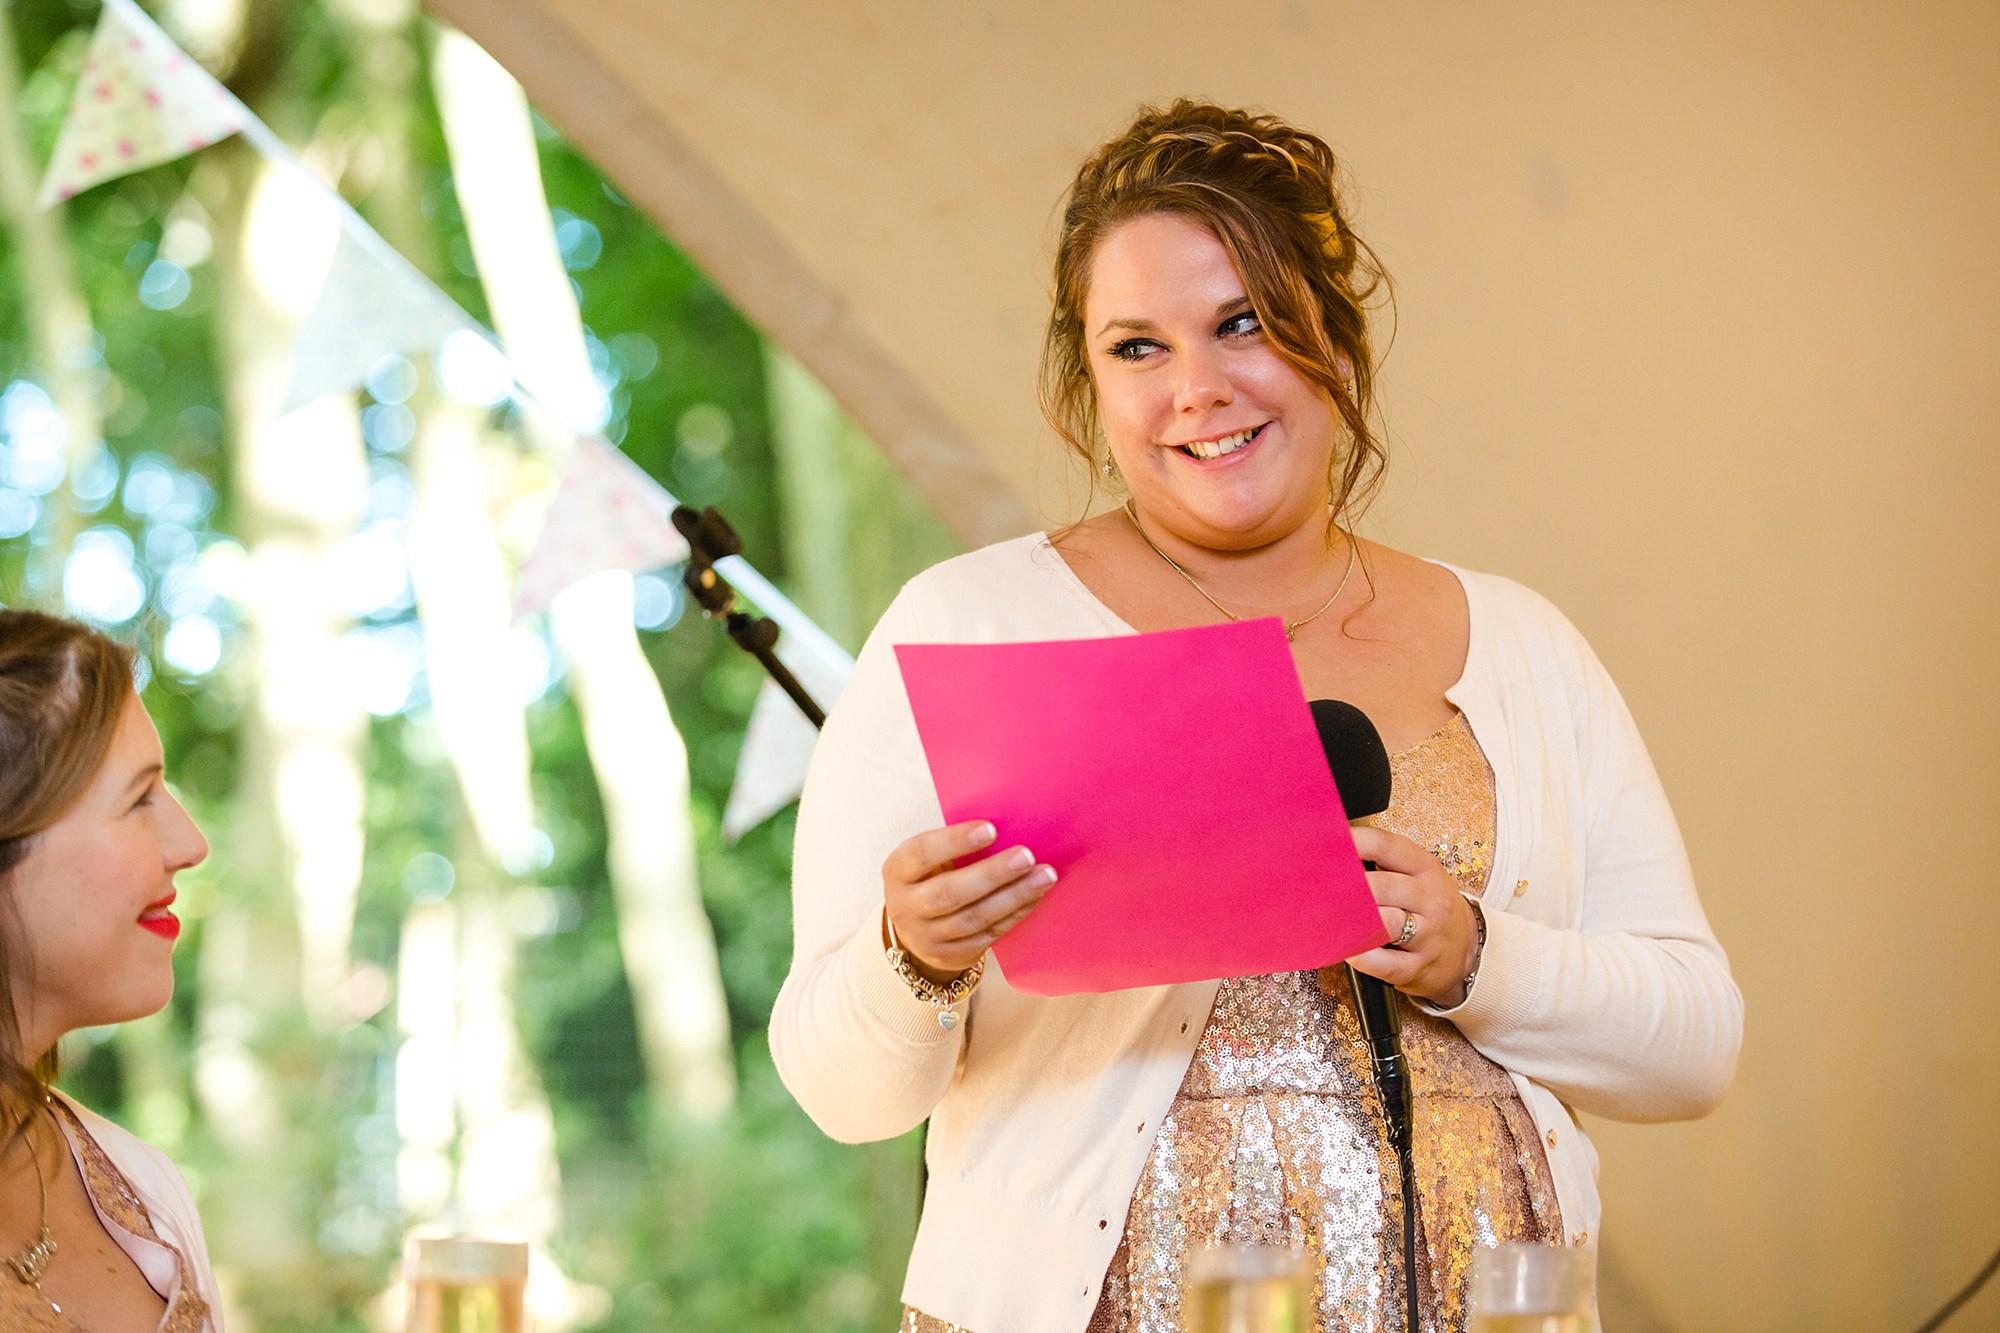 Woodland Weddings Tring bridesmaid speech